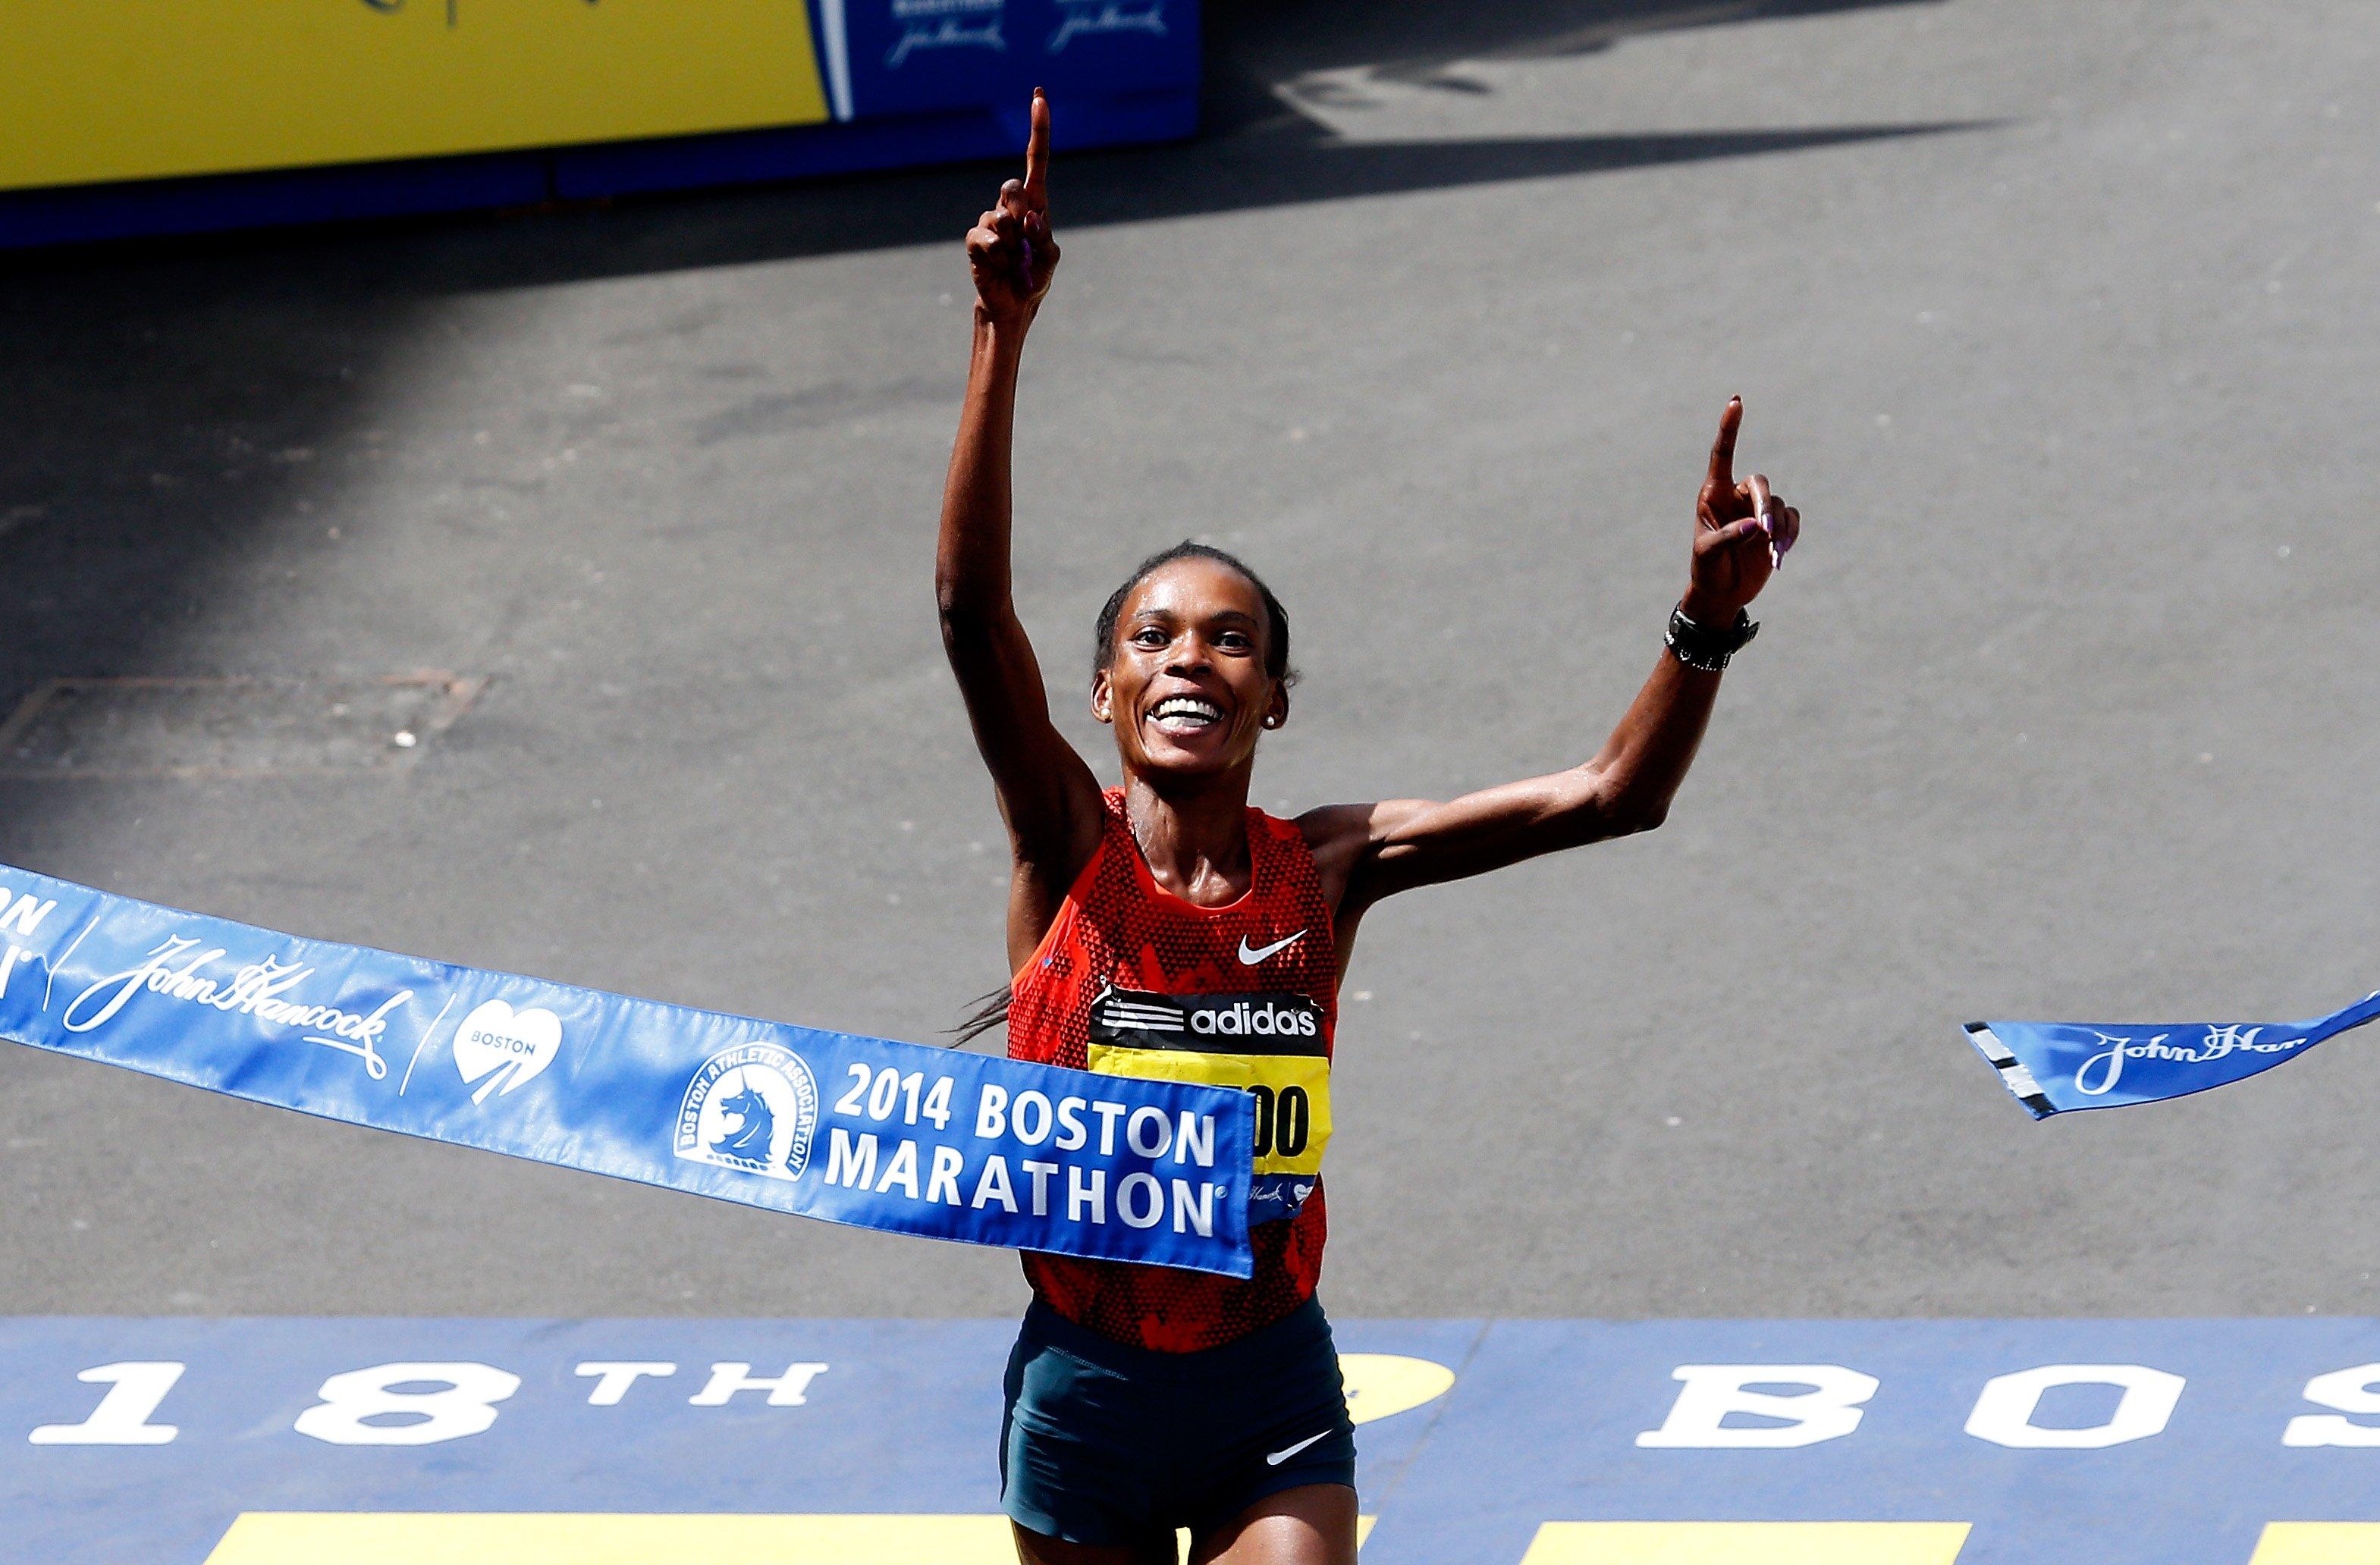 Rita Jeptoo of Kenya crosses the finish line to win the 118th Boston Marathon on April 21, 2014 in Boston, Ma.